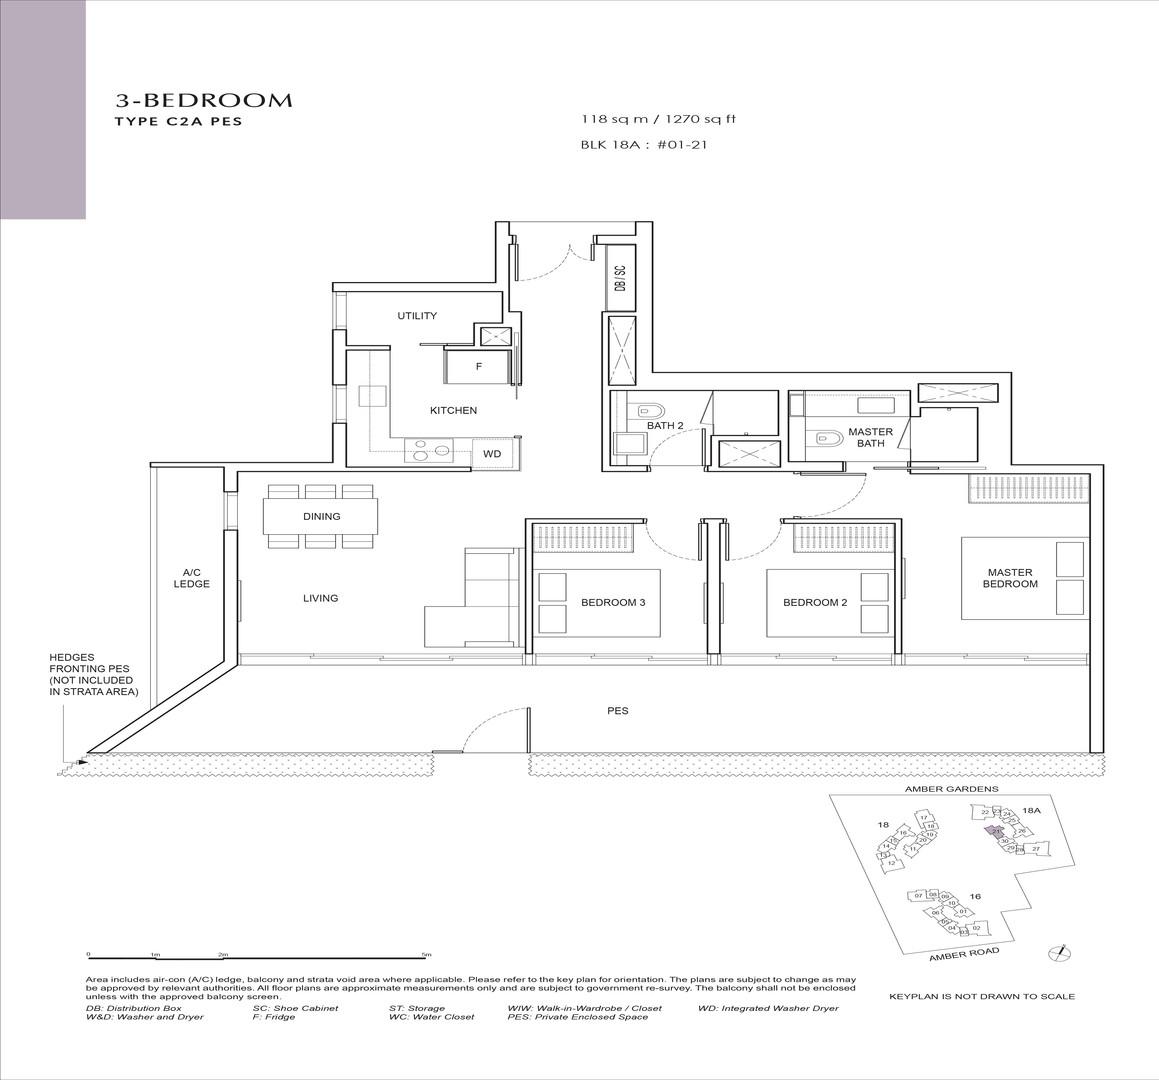 3-Bedroom_TypeC2A PES.jpg